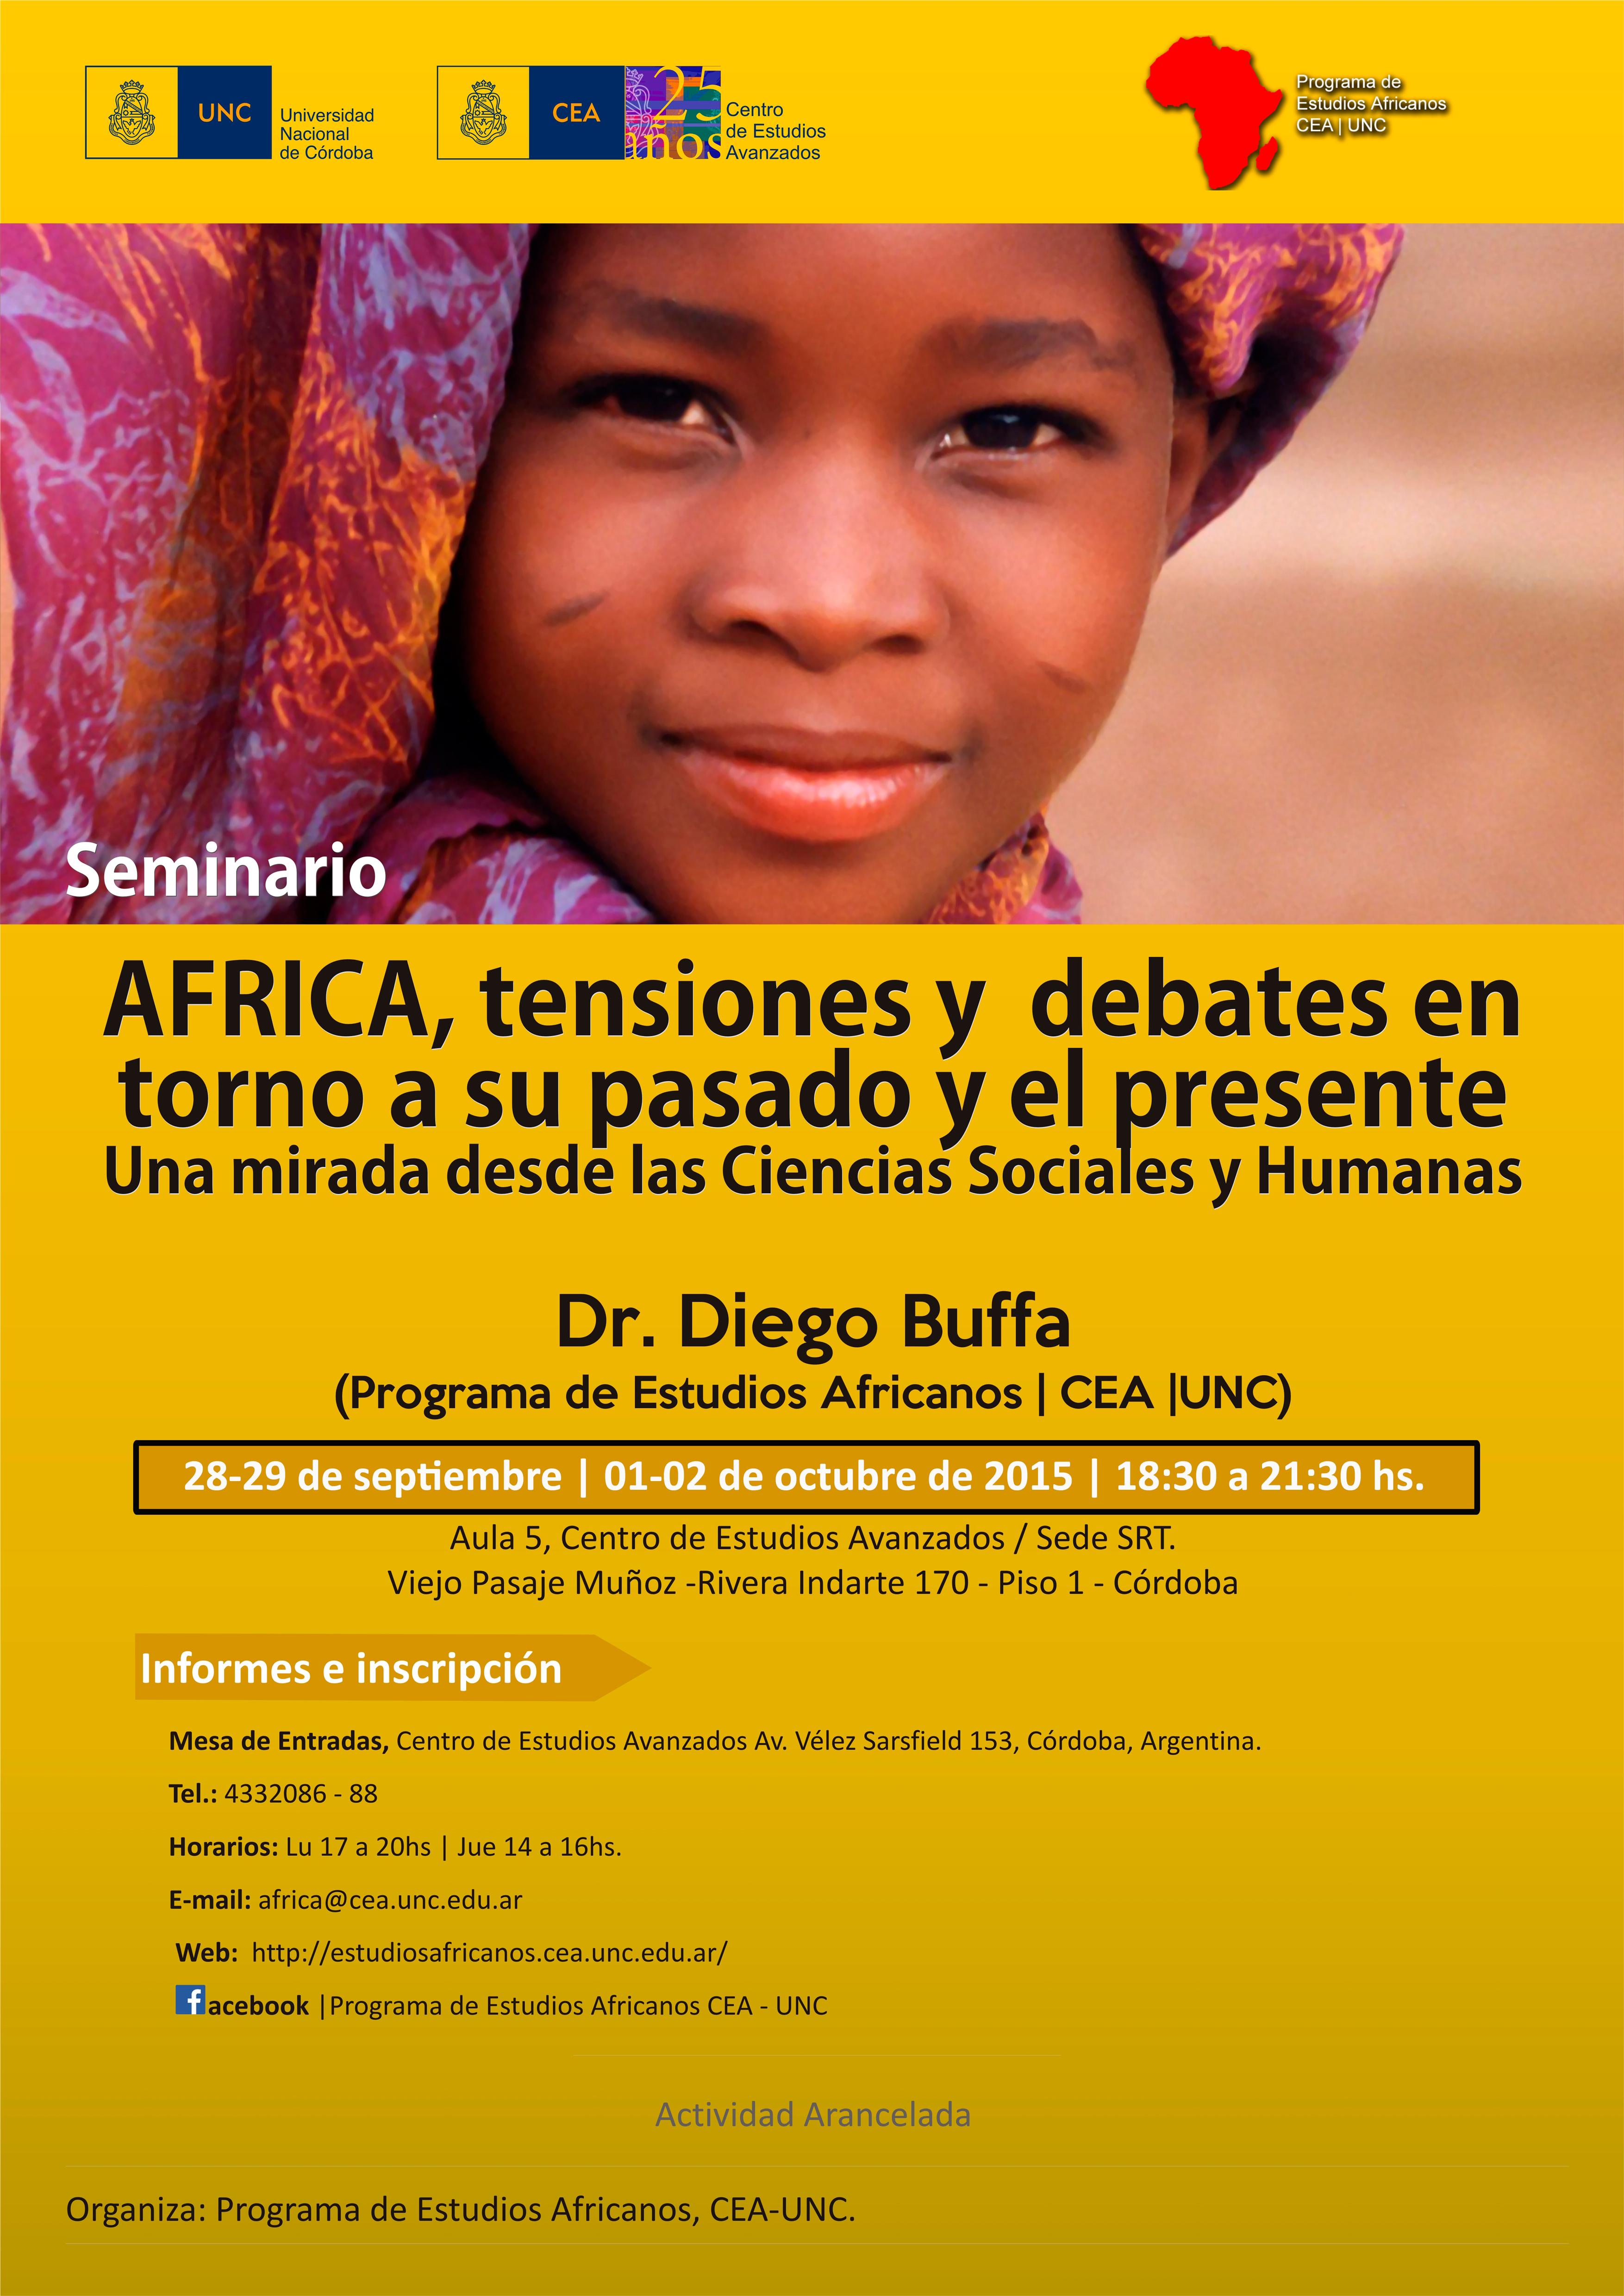 seminario-estudiosafricanos-Diego-Buffa-2015